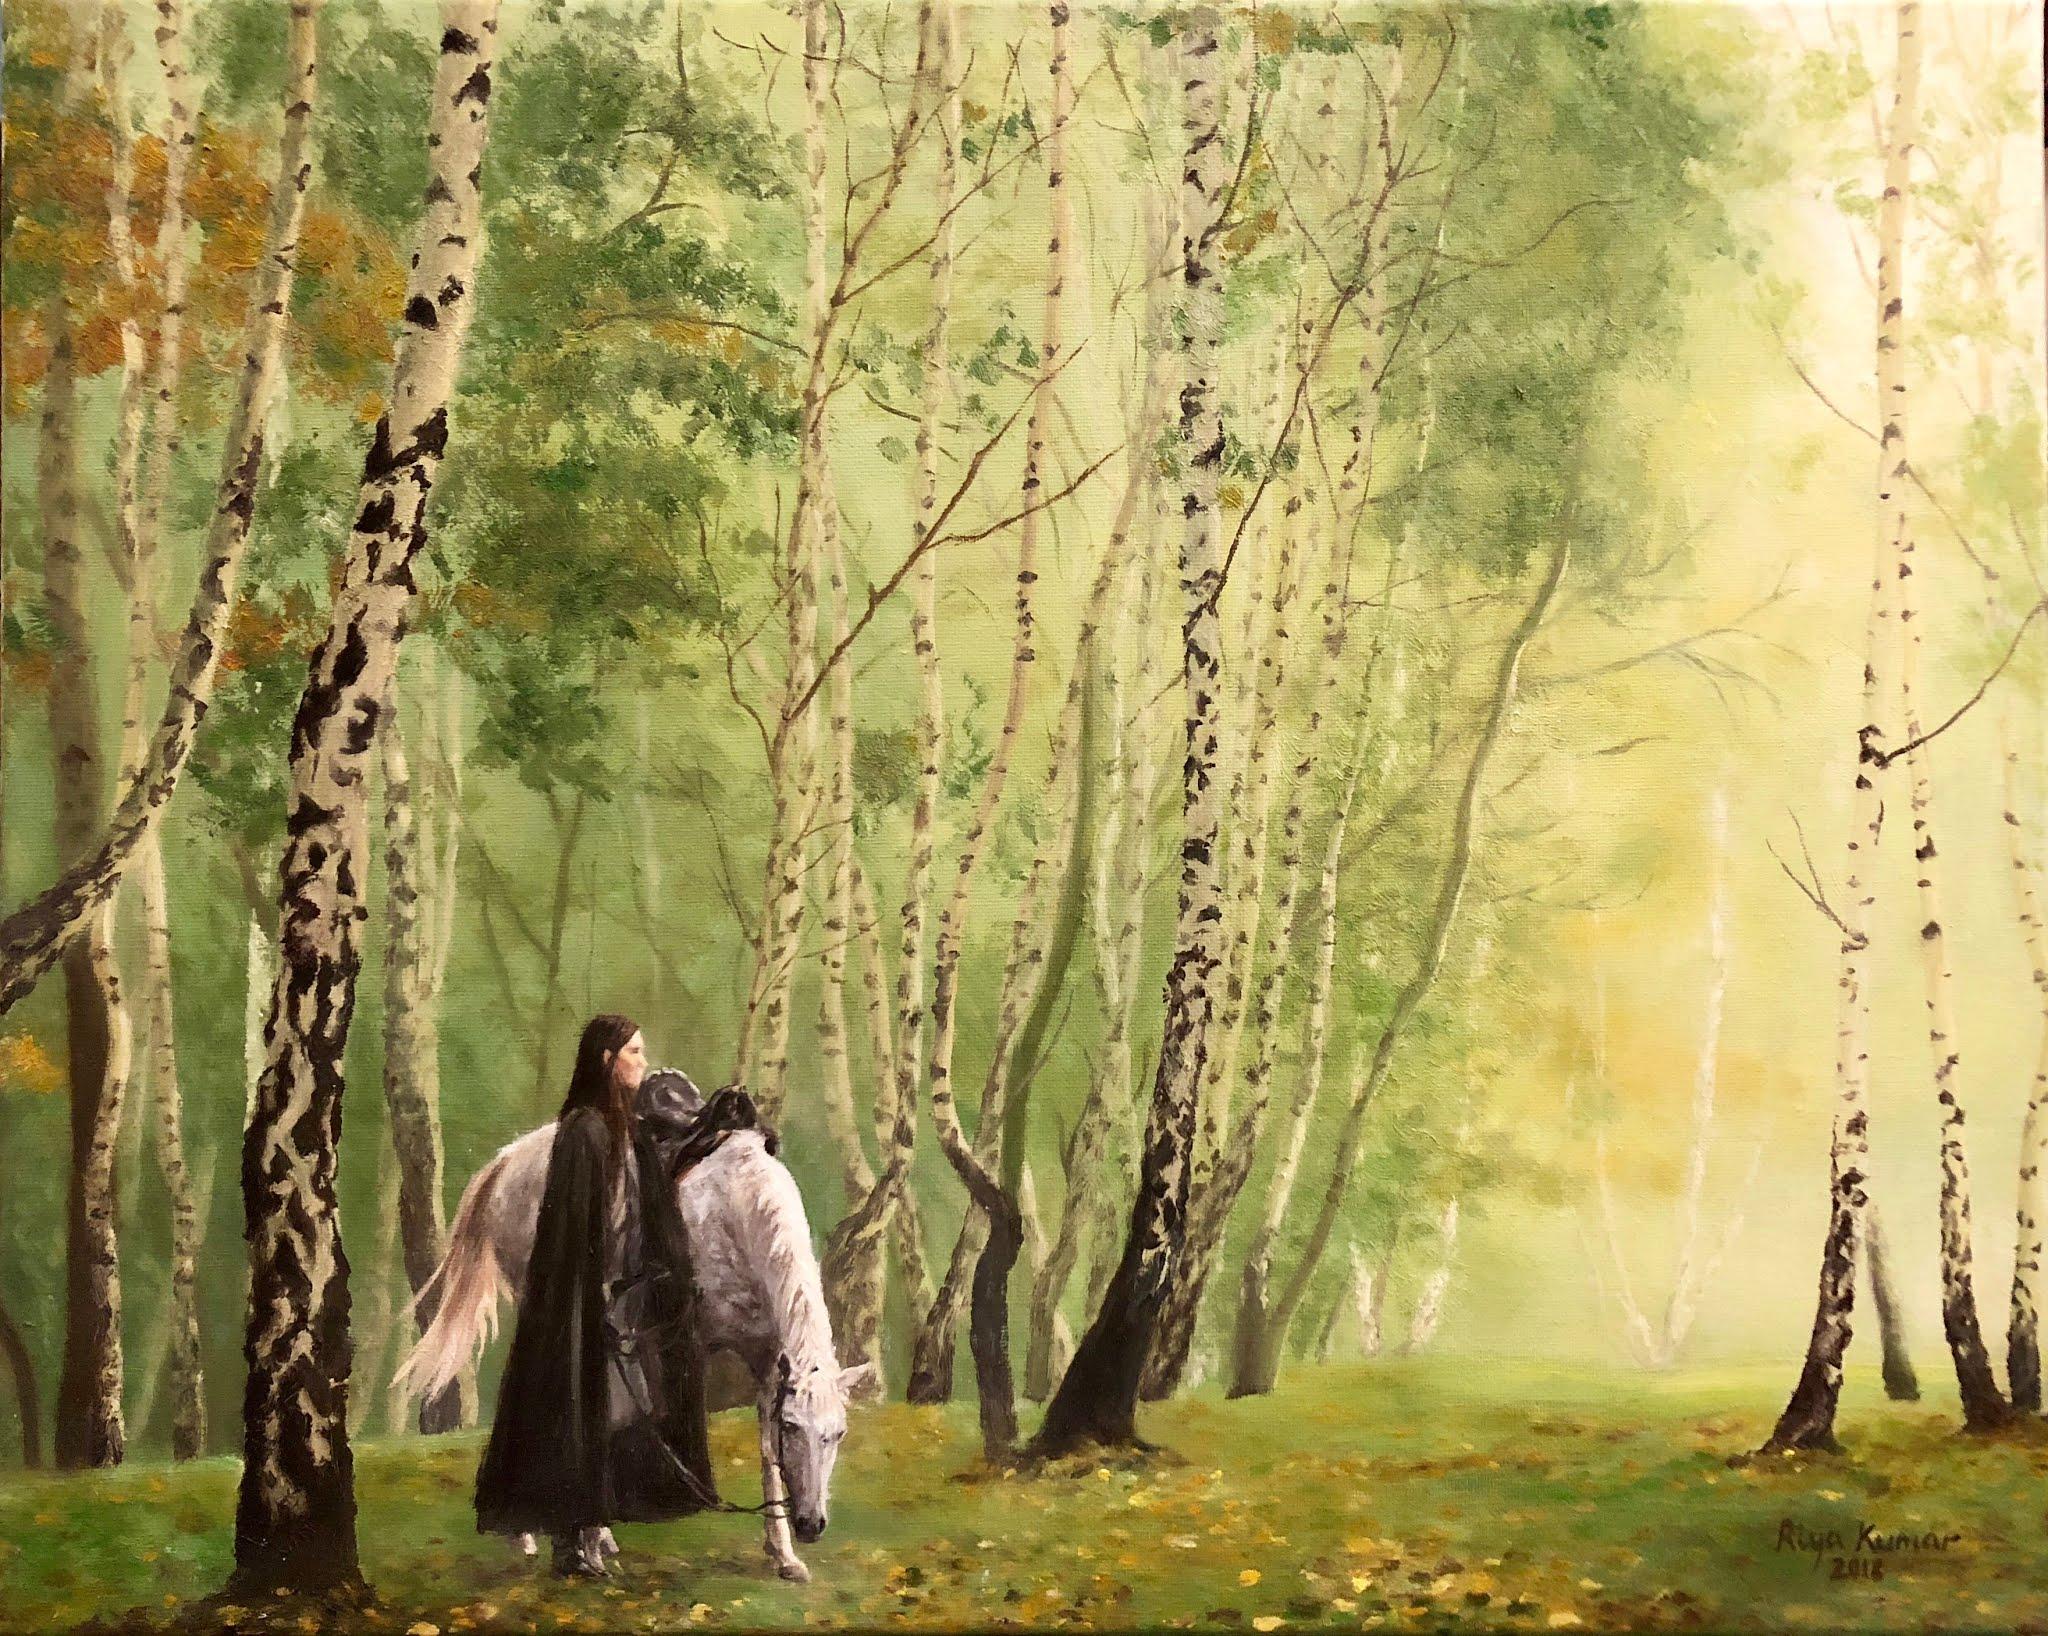 Media Type: Oil Painting